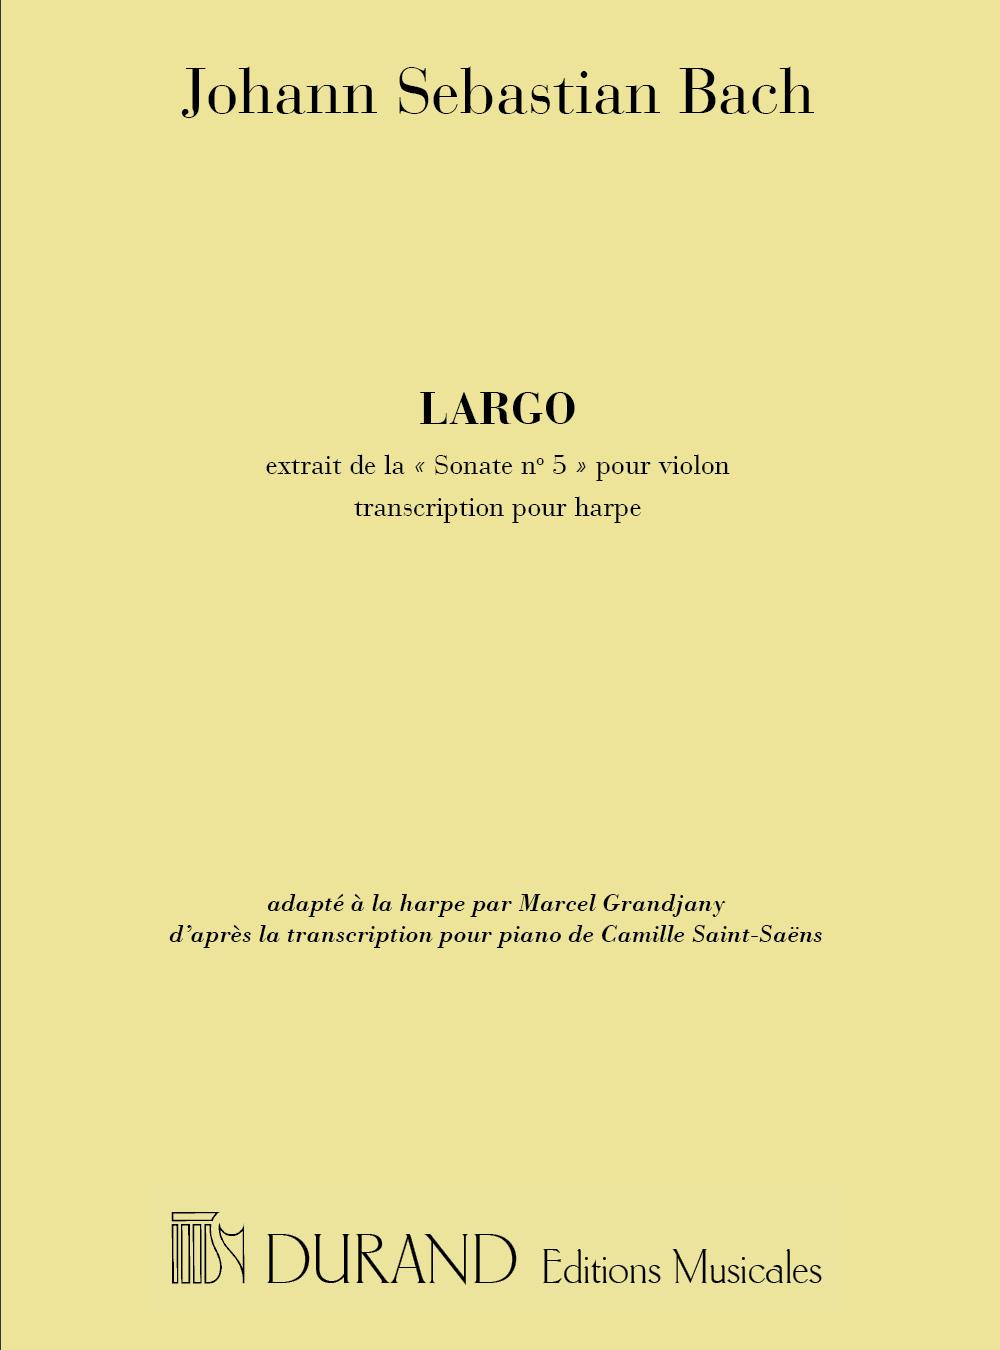 Johann Sebastian Bach: Largo Harpe (Sonate N 5 Violon Tr: Grandjany: Harp